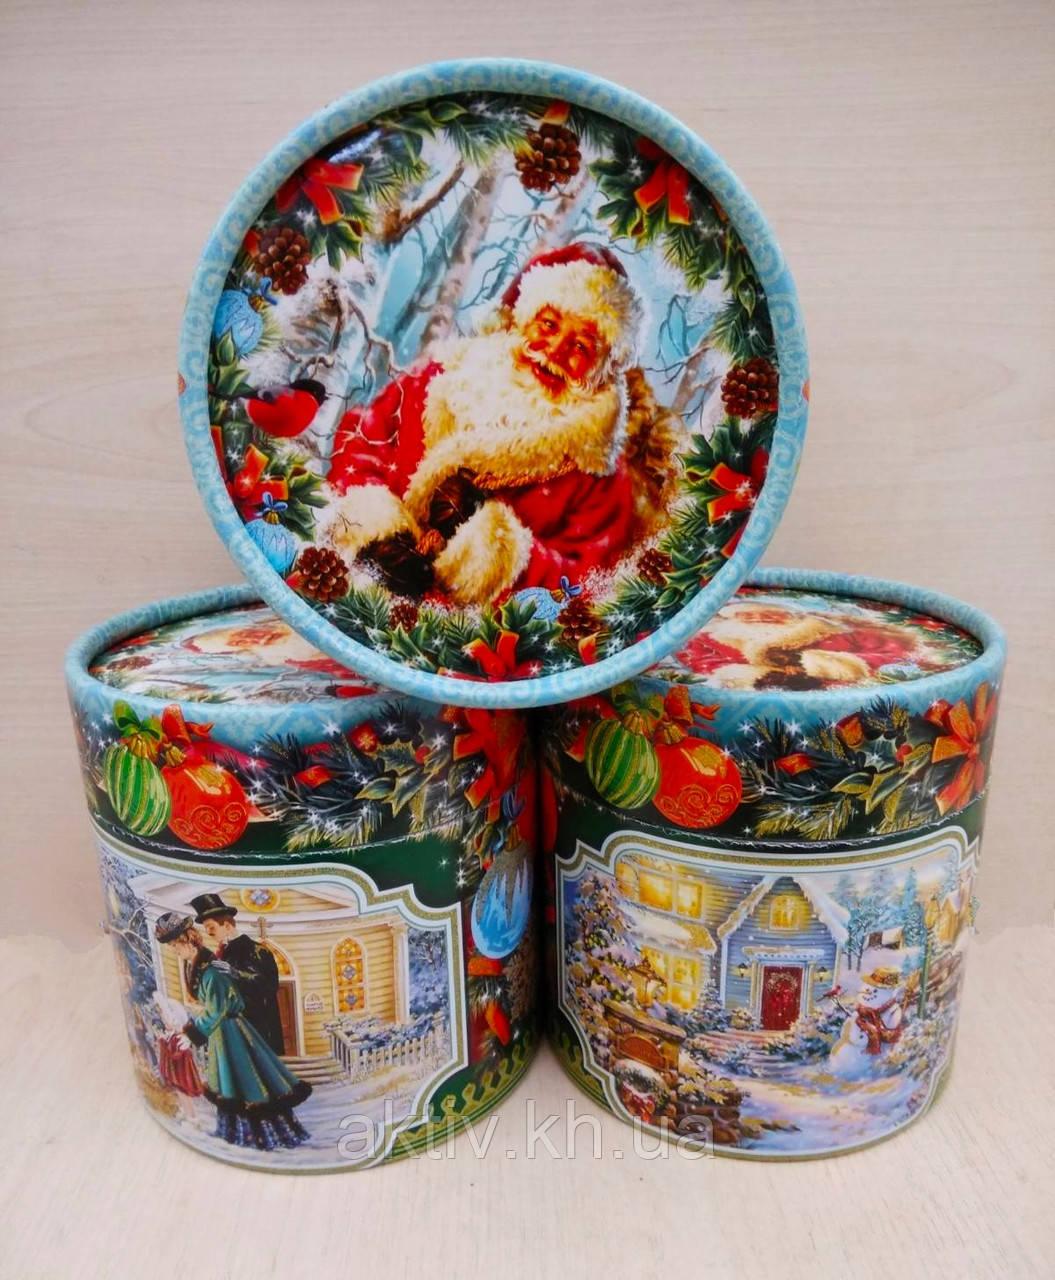 "Новогодний подарок ,, Ассорти конфет"" 800 грамм"